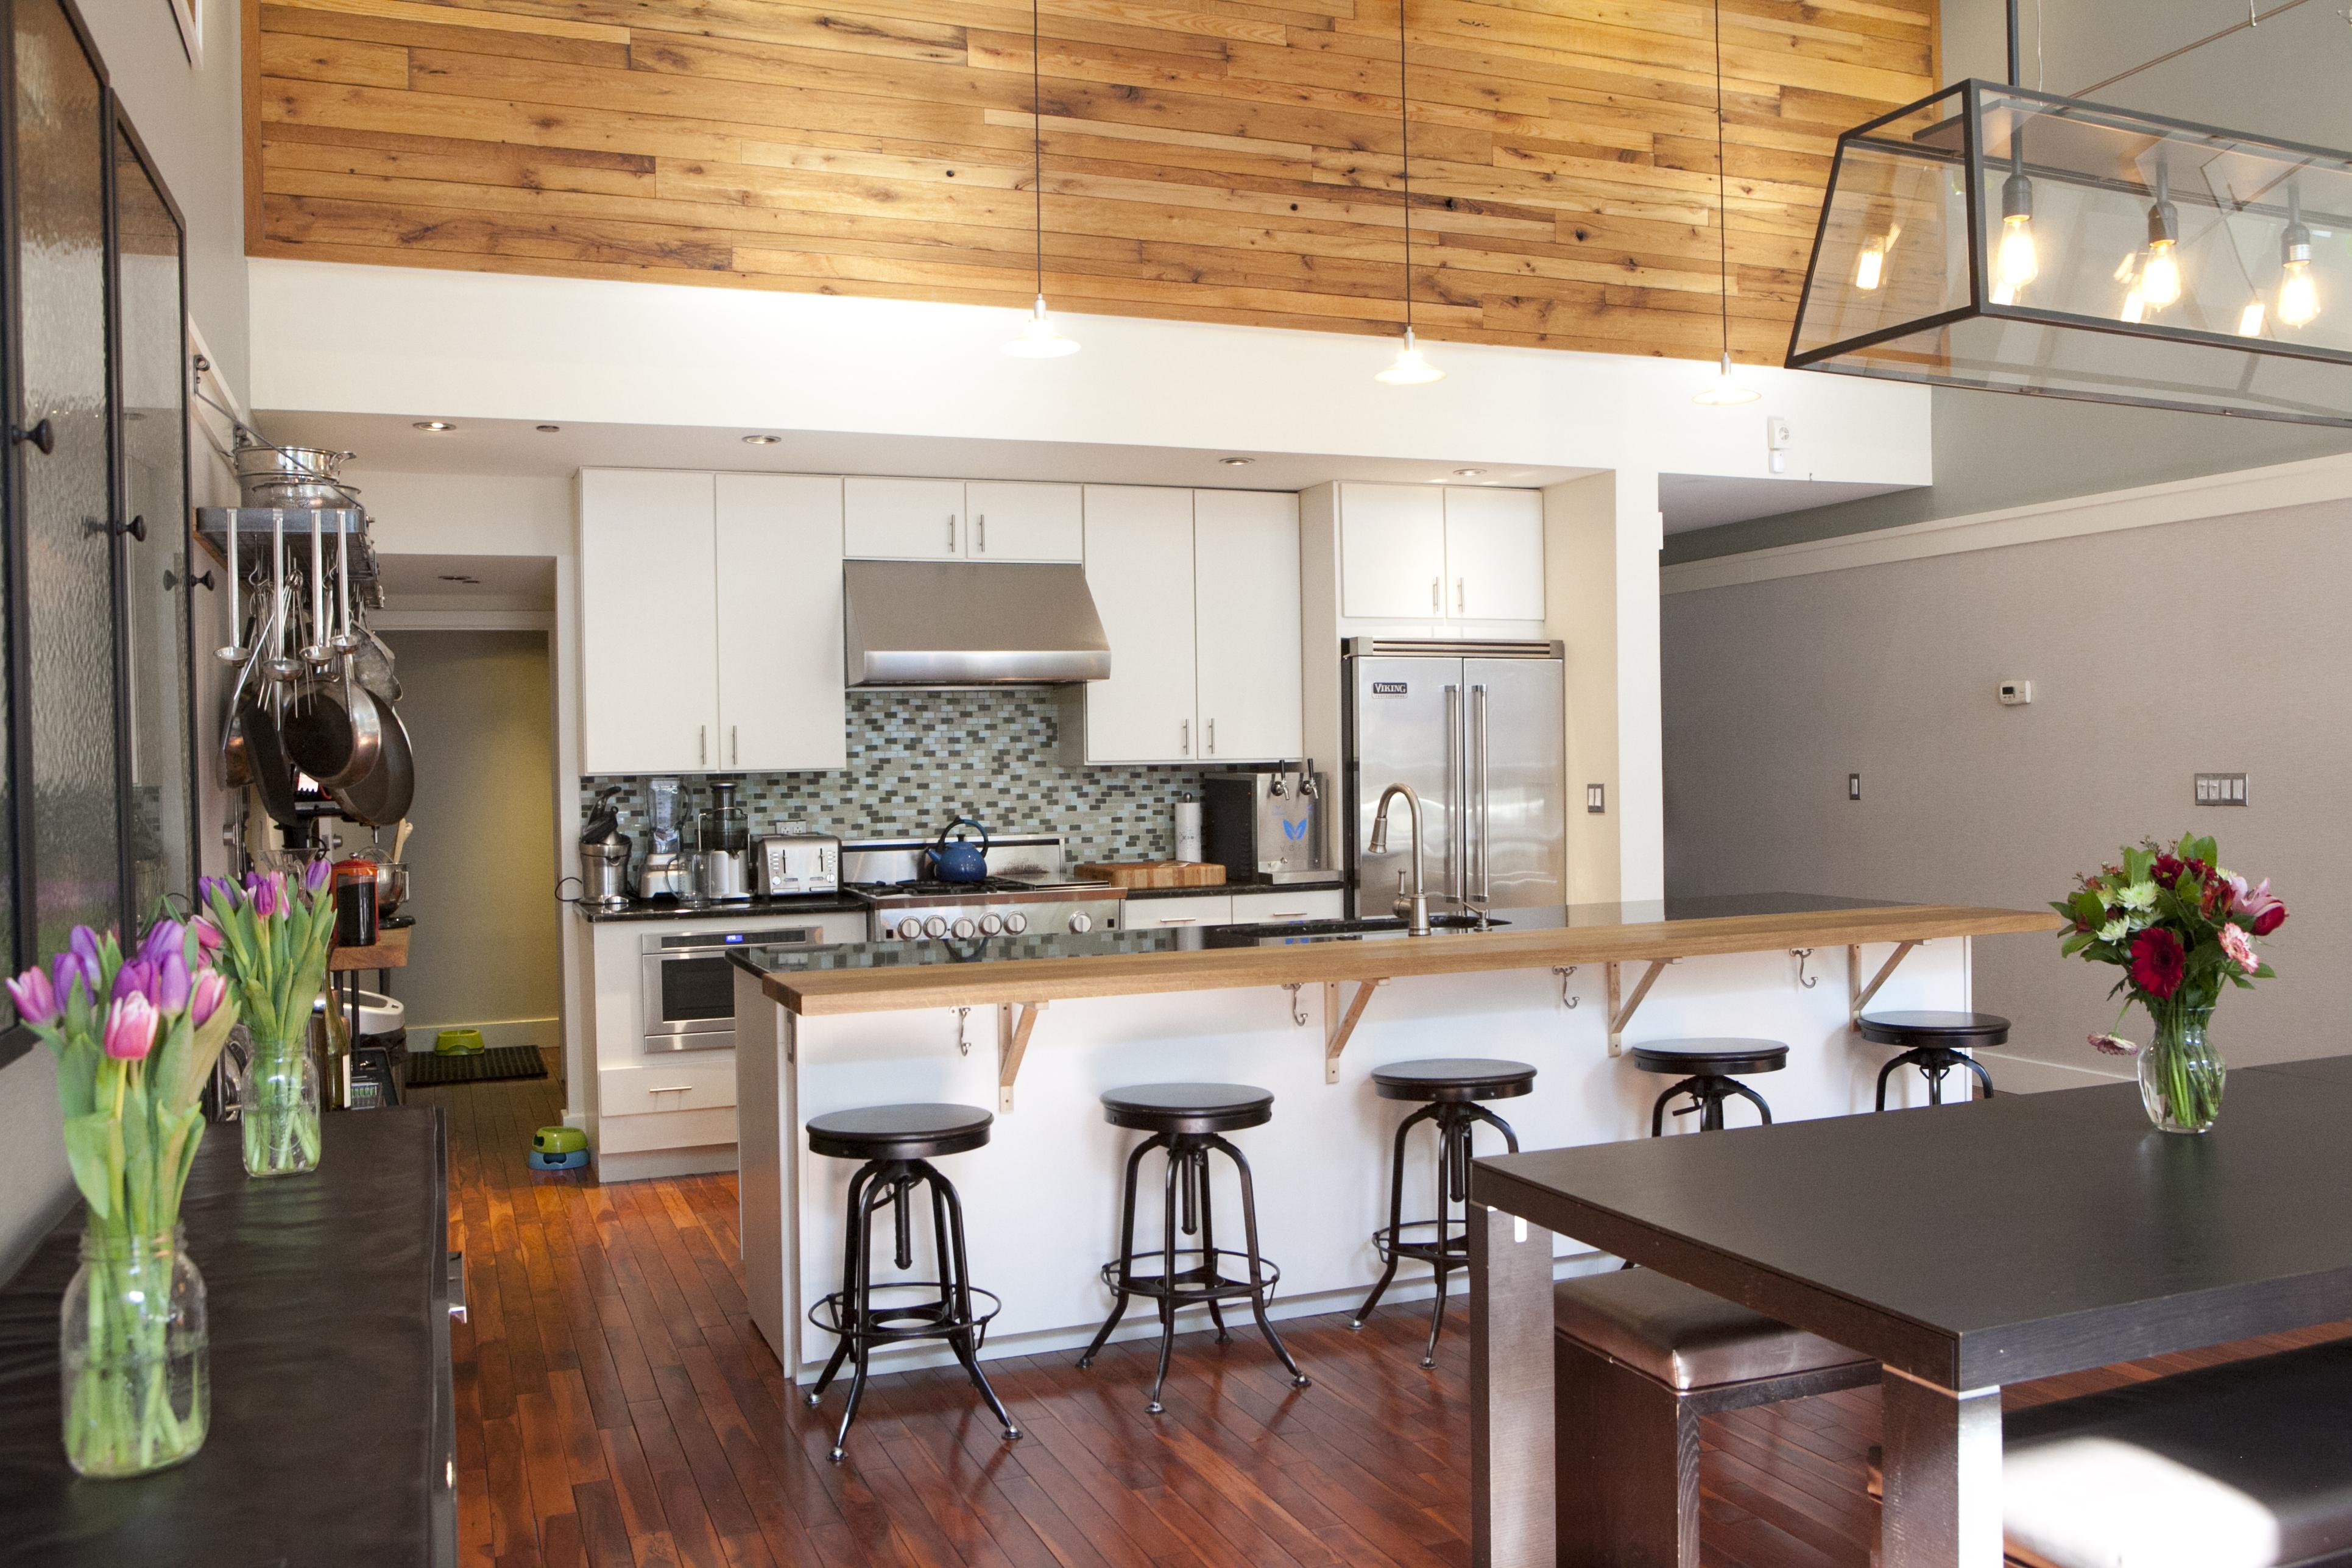 Home Kitchen Chef Jose Garces Reveals His Sleek Home Kitchen In Logan Square